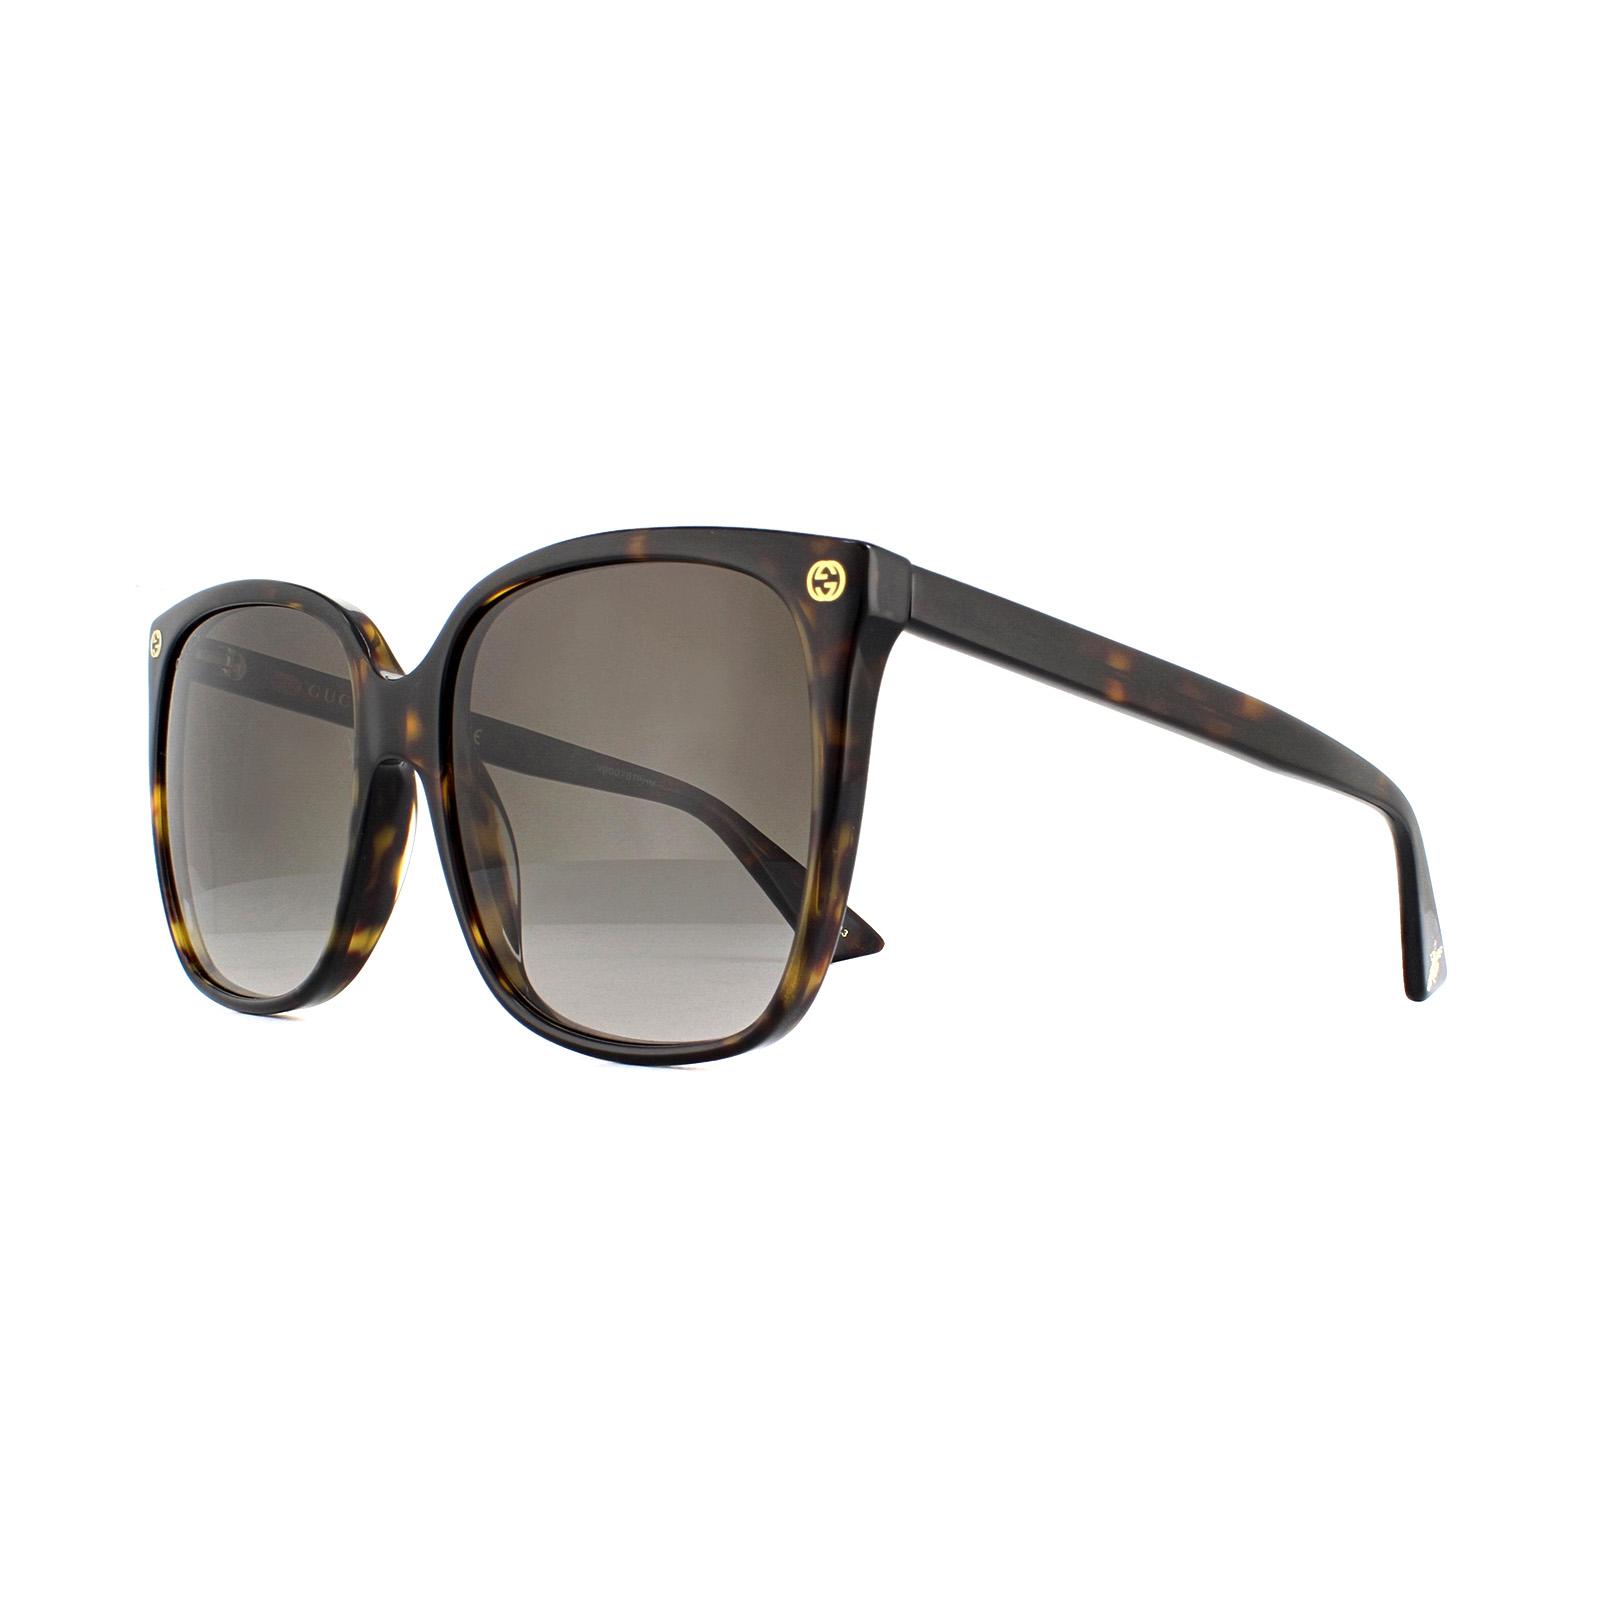 a0a107b9fe32b Cheap Gucci GG0022S Sunglasses - Discounted Sunglasses